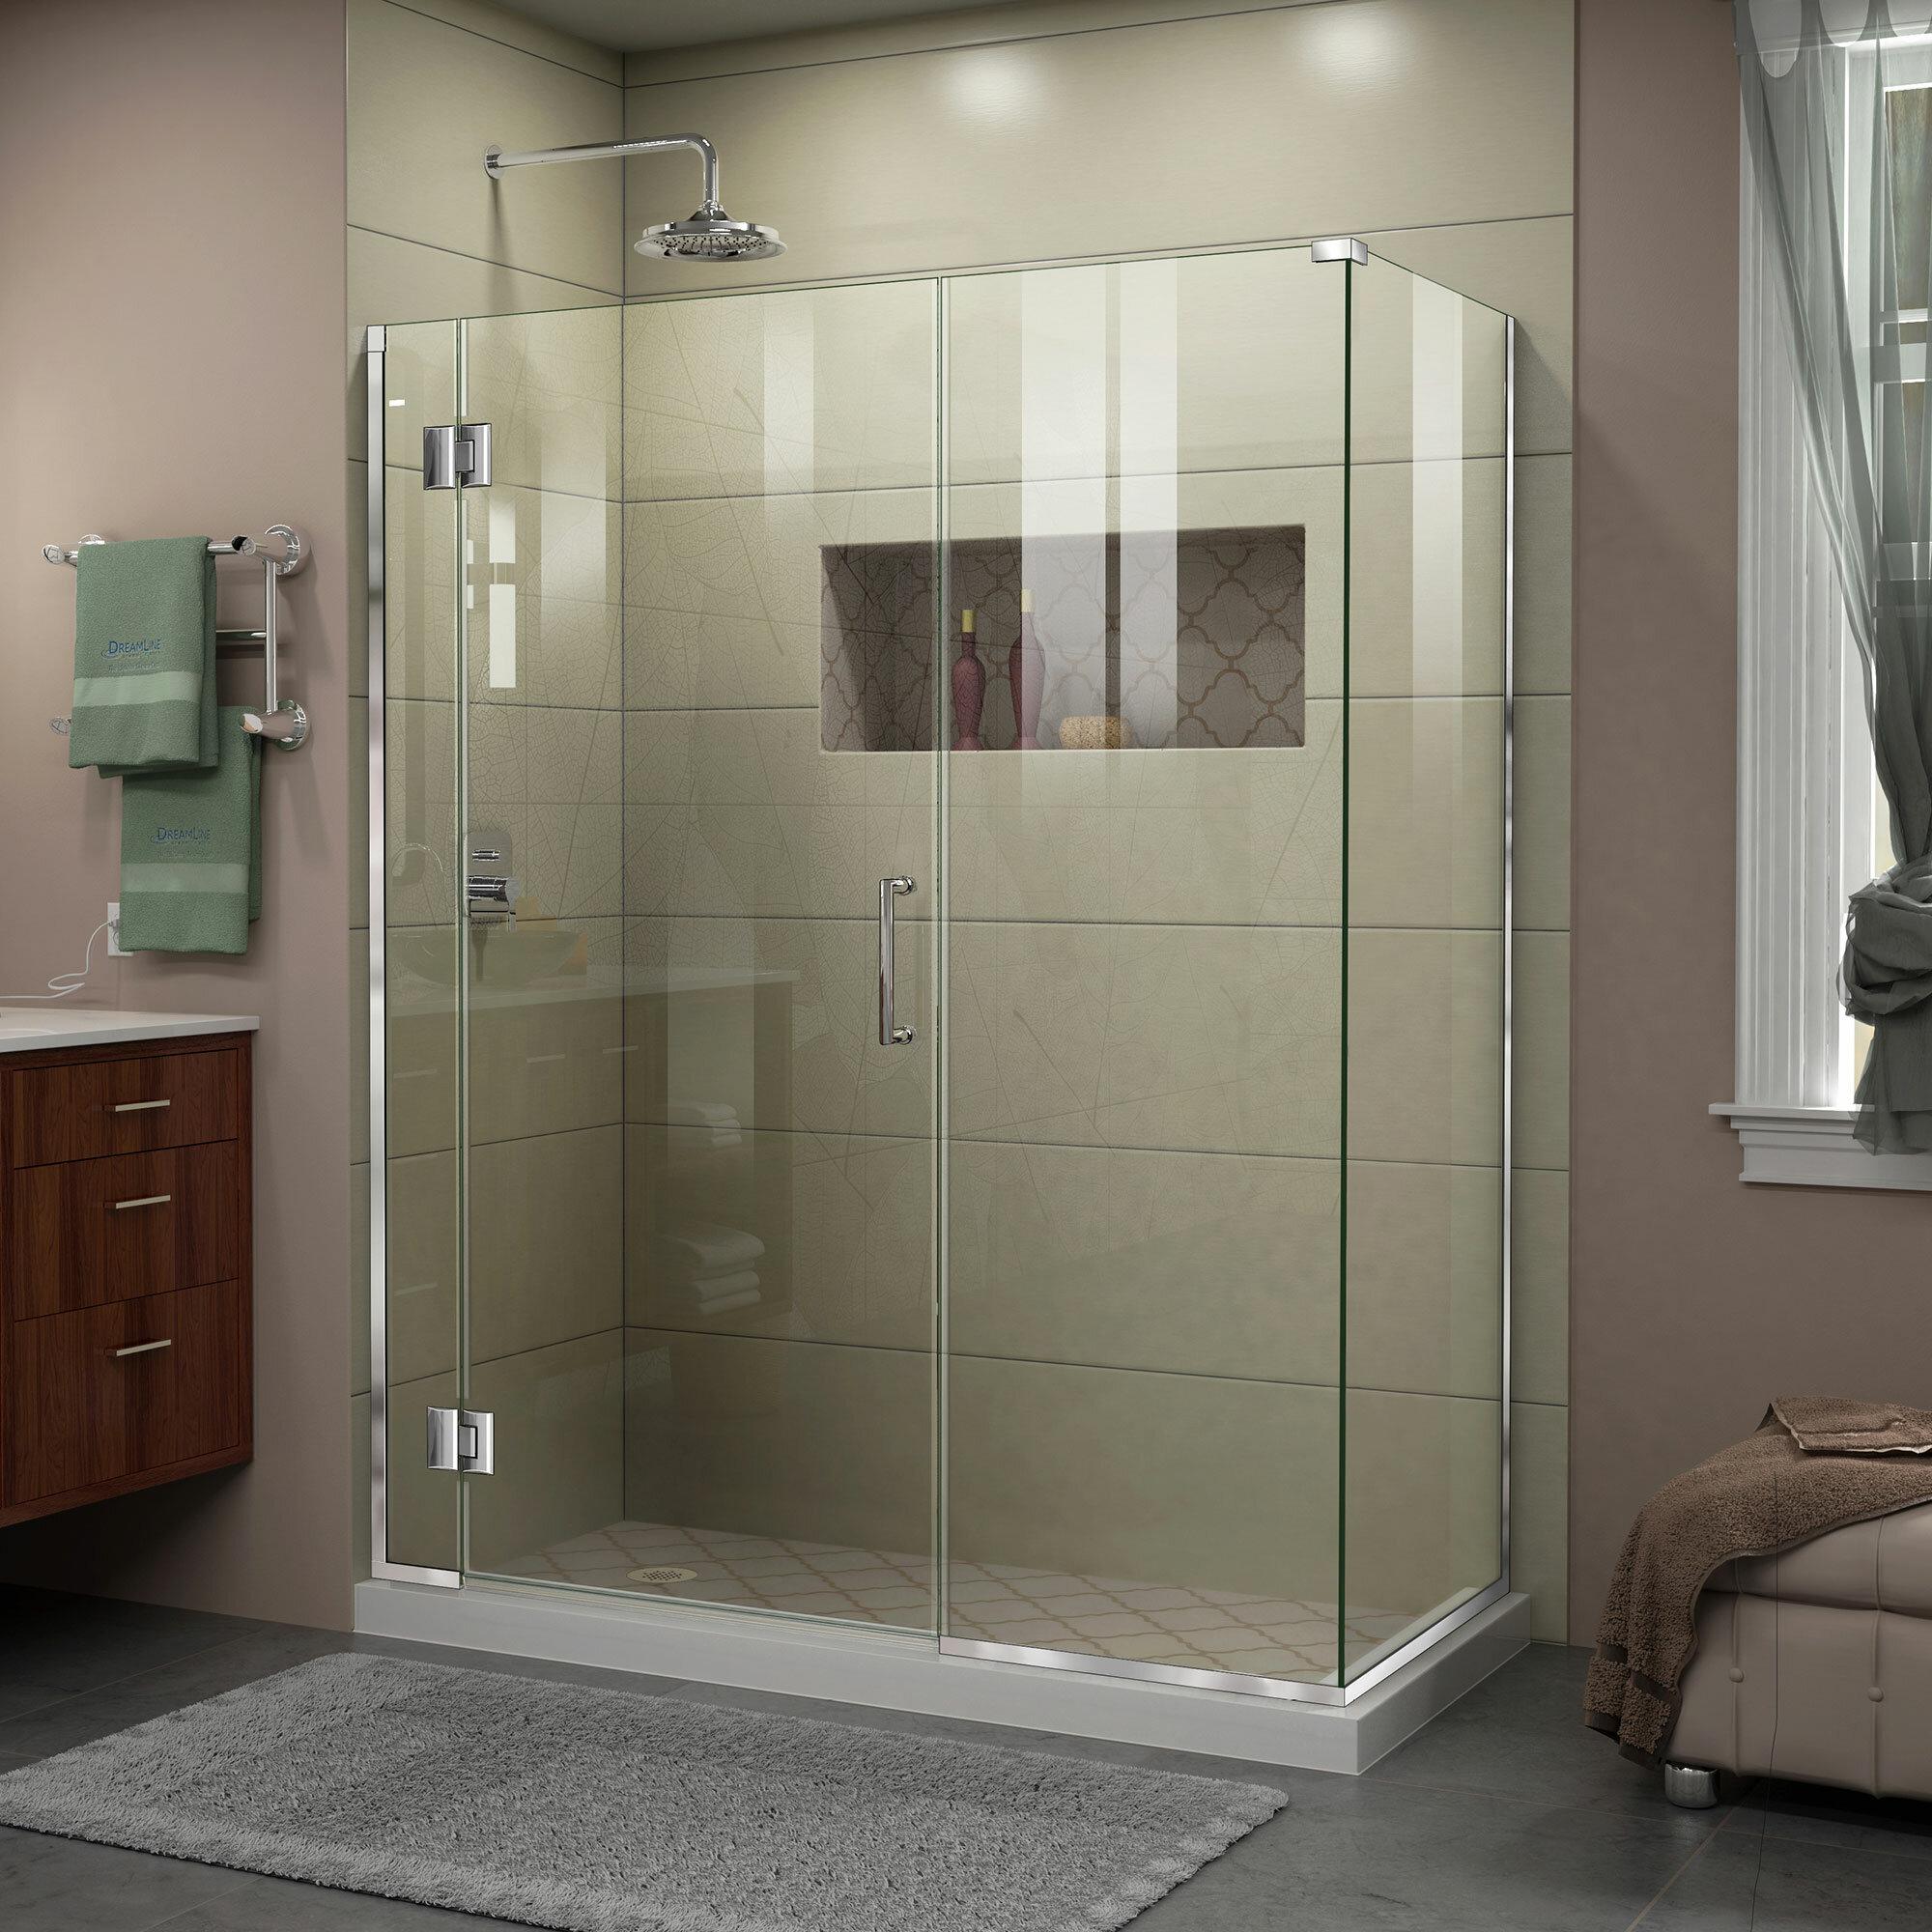 Unidoor X 52 5 X 72 Hinged Frameless Shower Door With Clearmax Technology